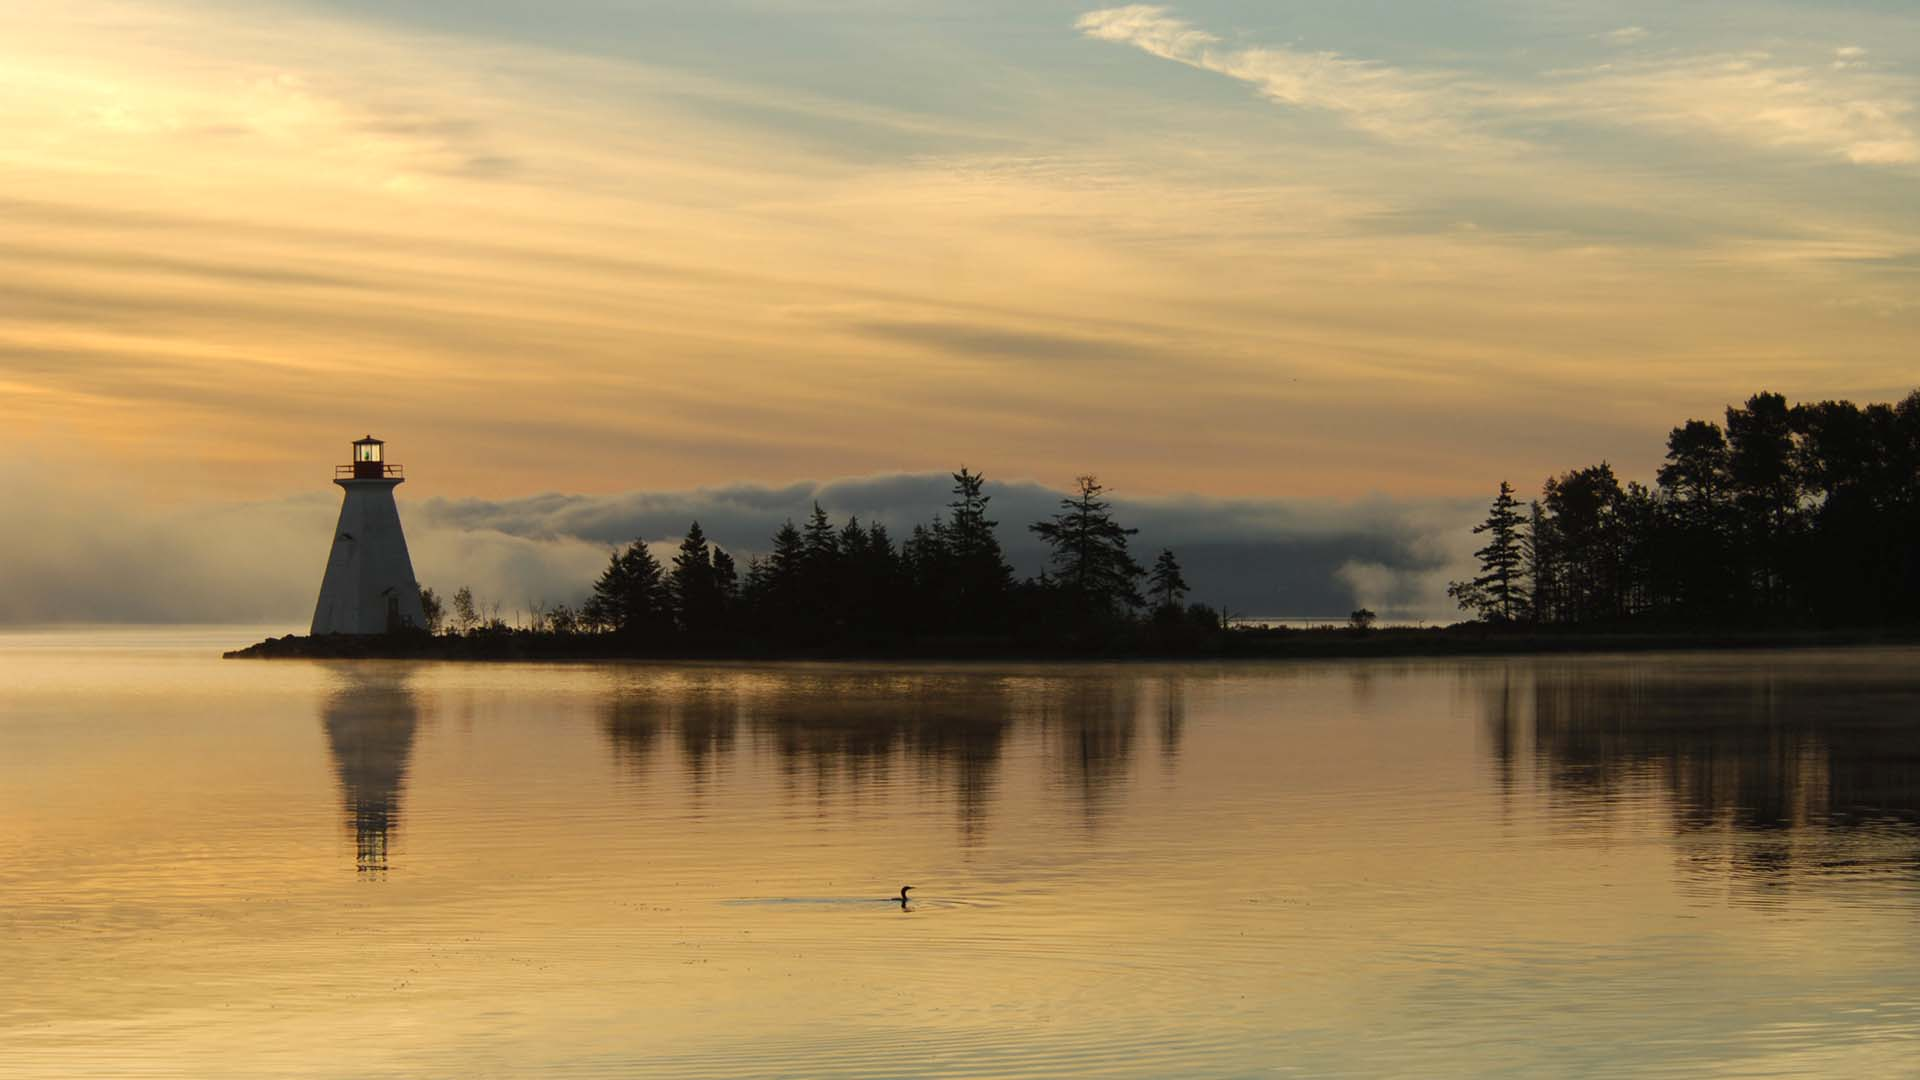 Bras d'Or Lake Biosphere Reserve